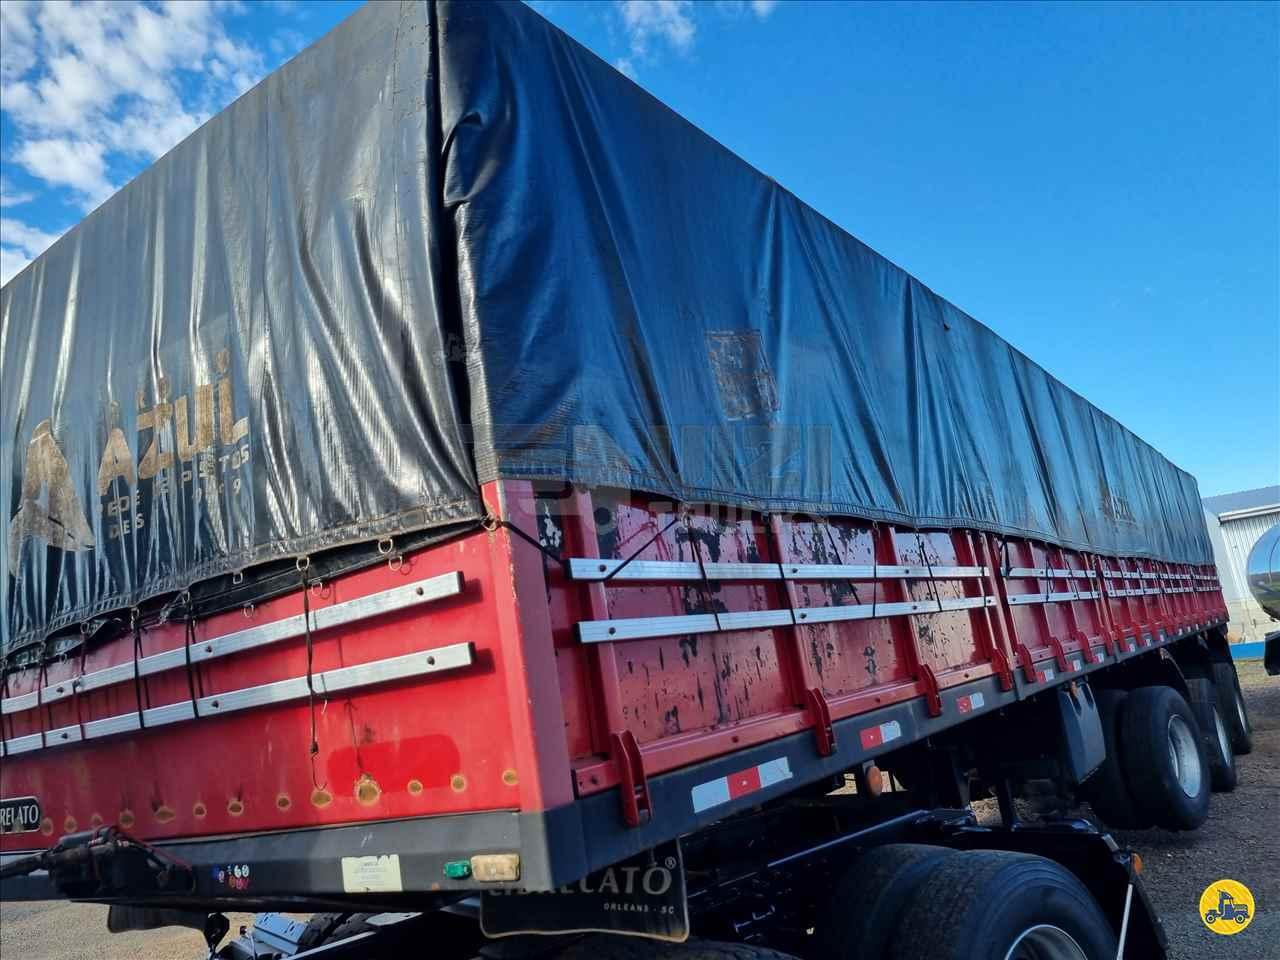 CARRETA SEMI-REBOQUE GRANELEIRO Vizi Trucks DOIS VIZINHOS PARANÁ PR